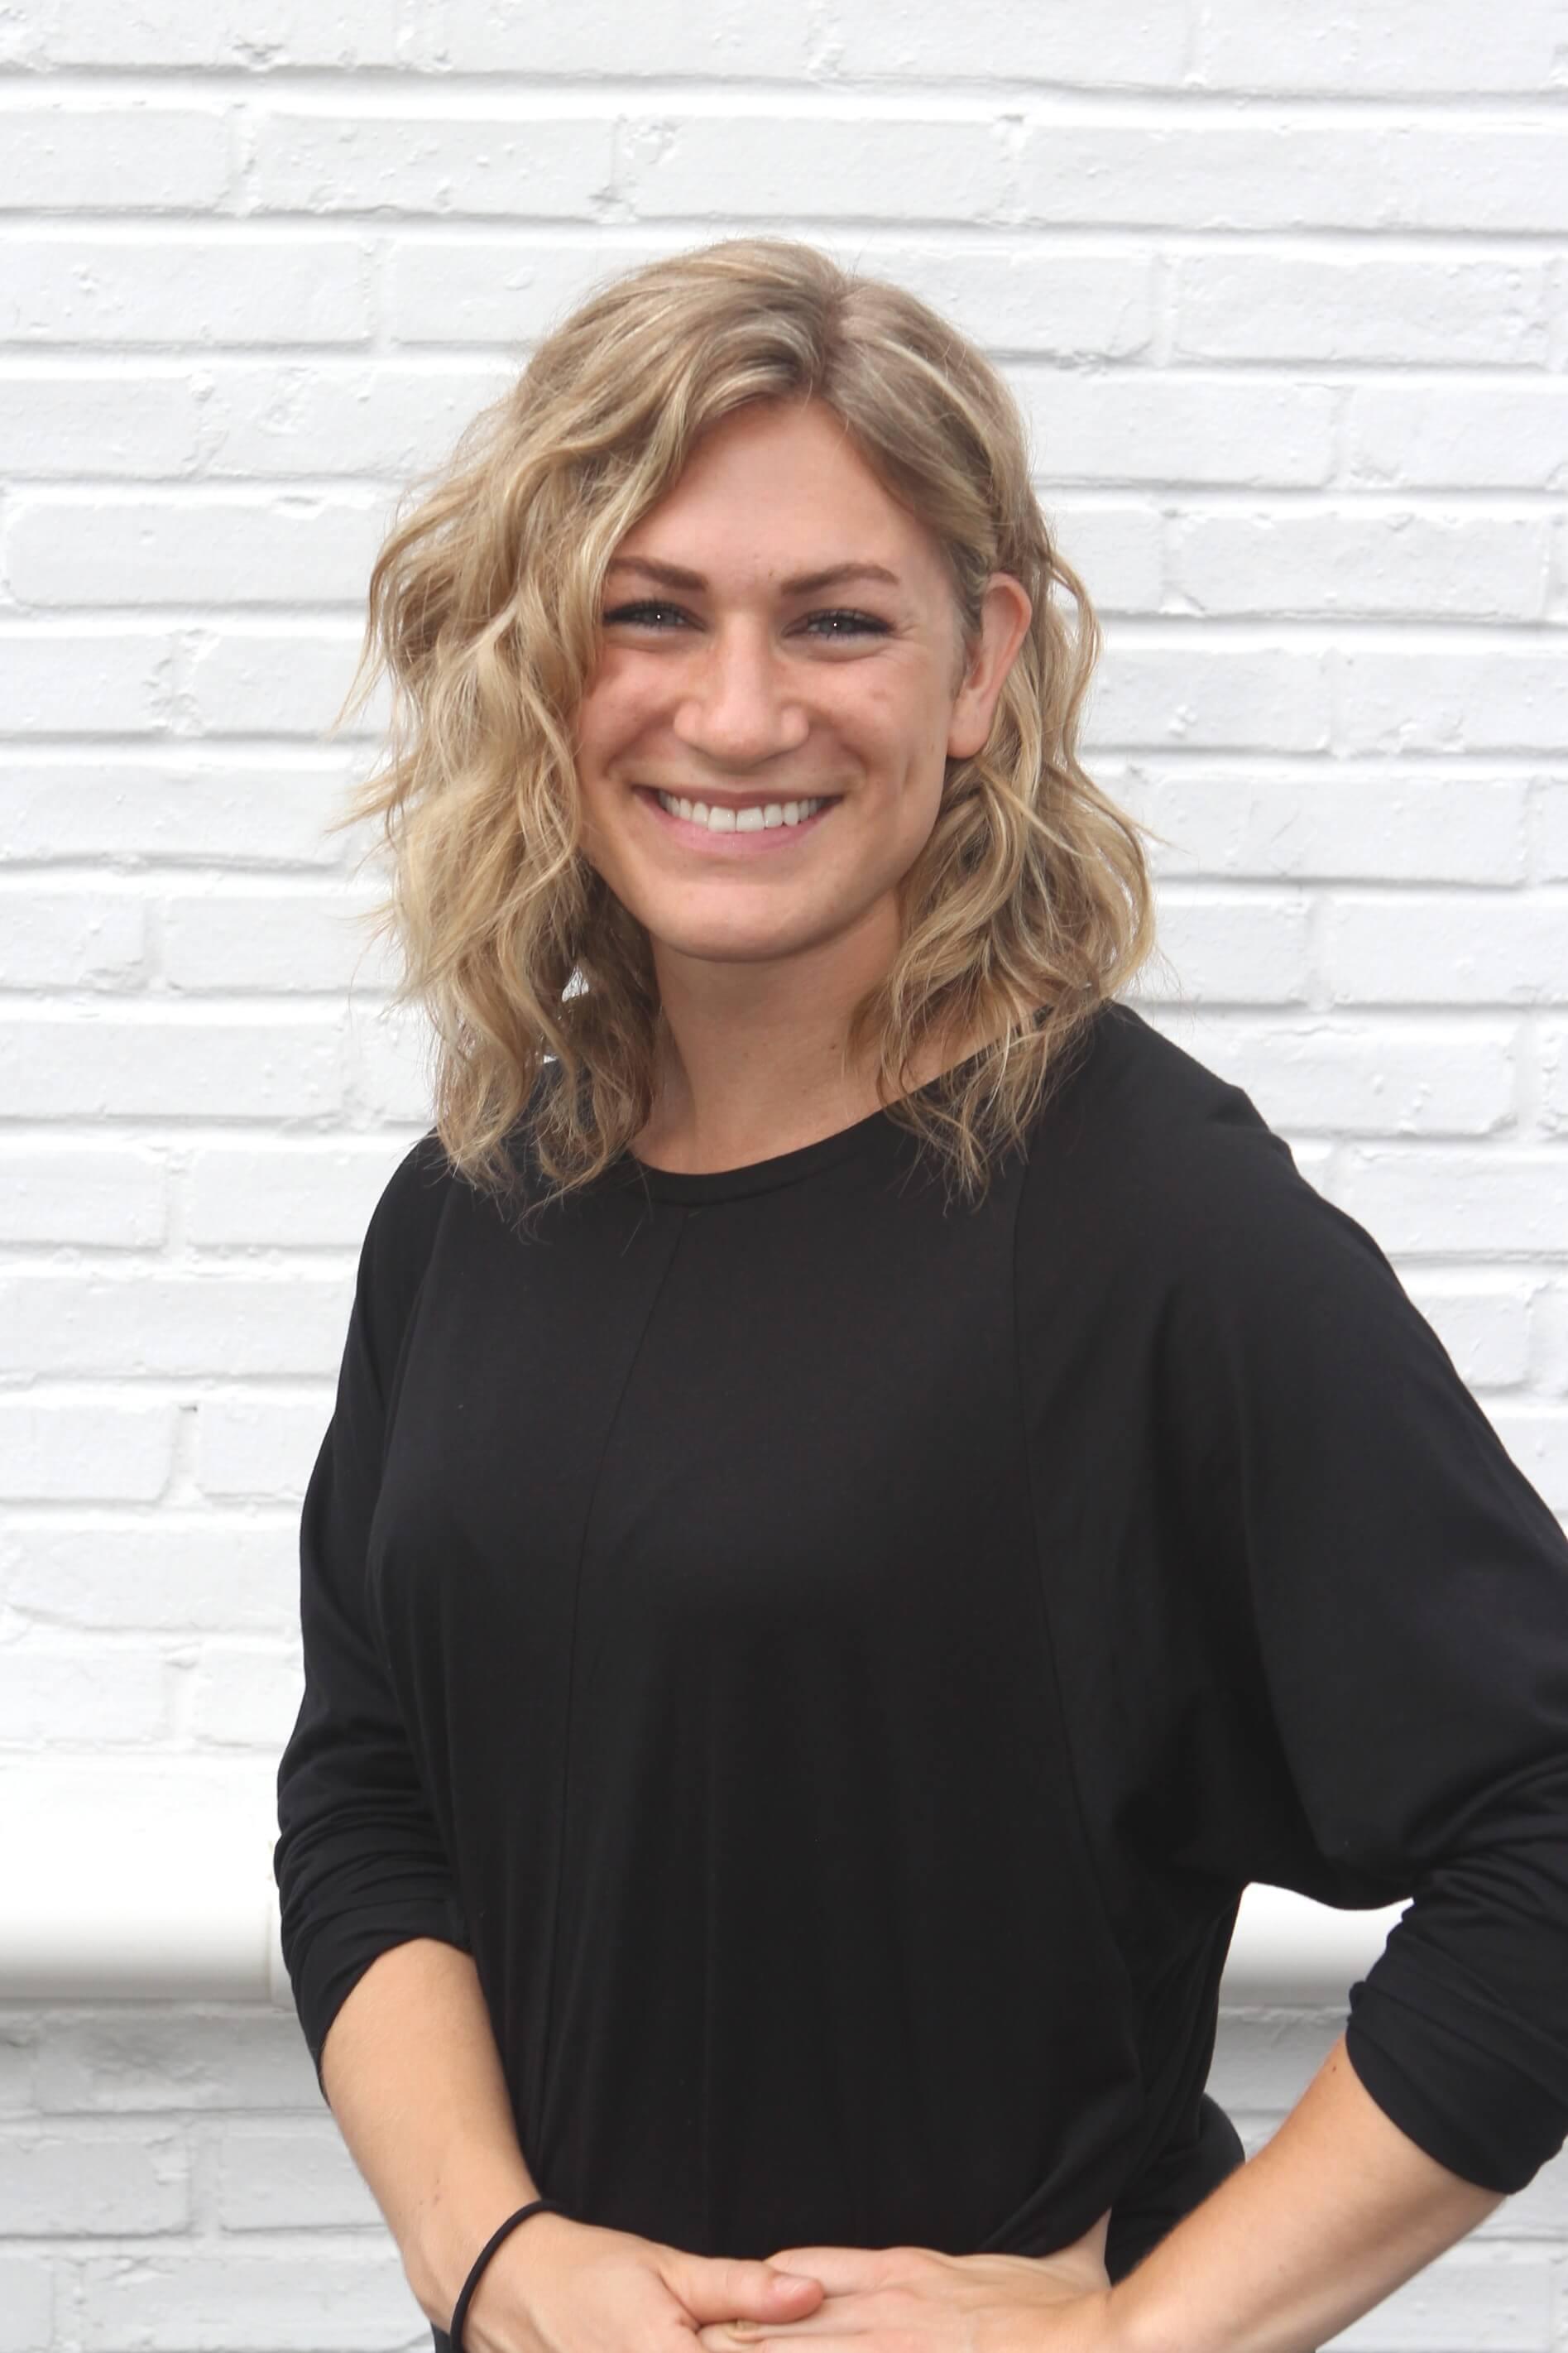 Alexandra Hoerr Child Therapist and Play Therapist